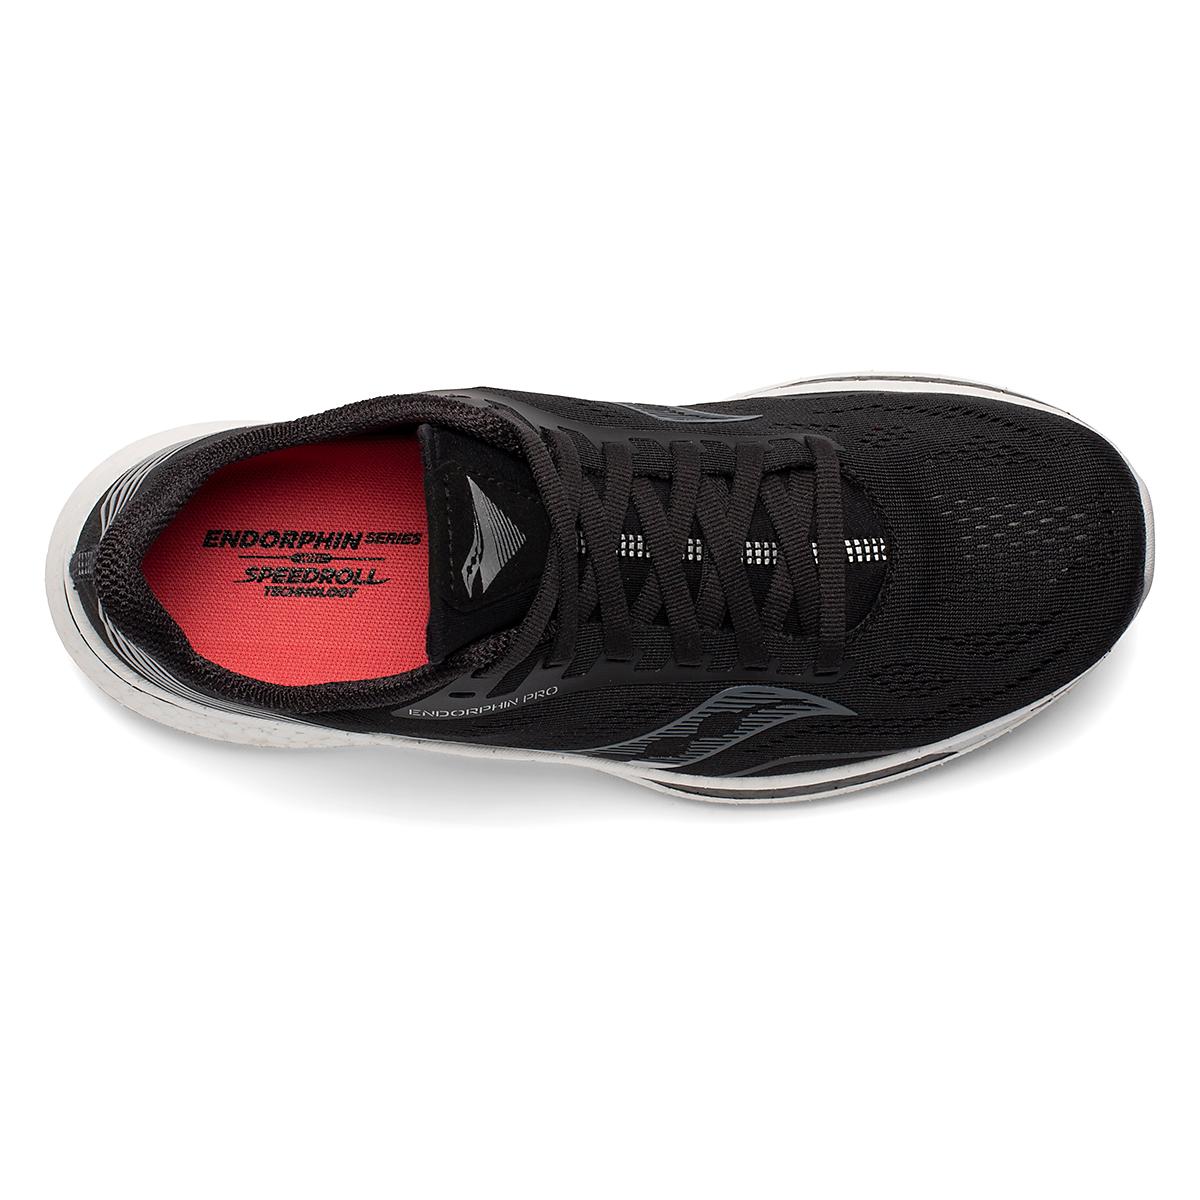 Women's Saucony Endorphin Pro Running Shoe - Color: Black/Silver - Size: 5 - Width: Regular, Black/Silver, large, image 4